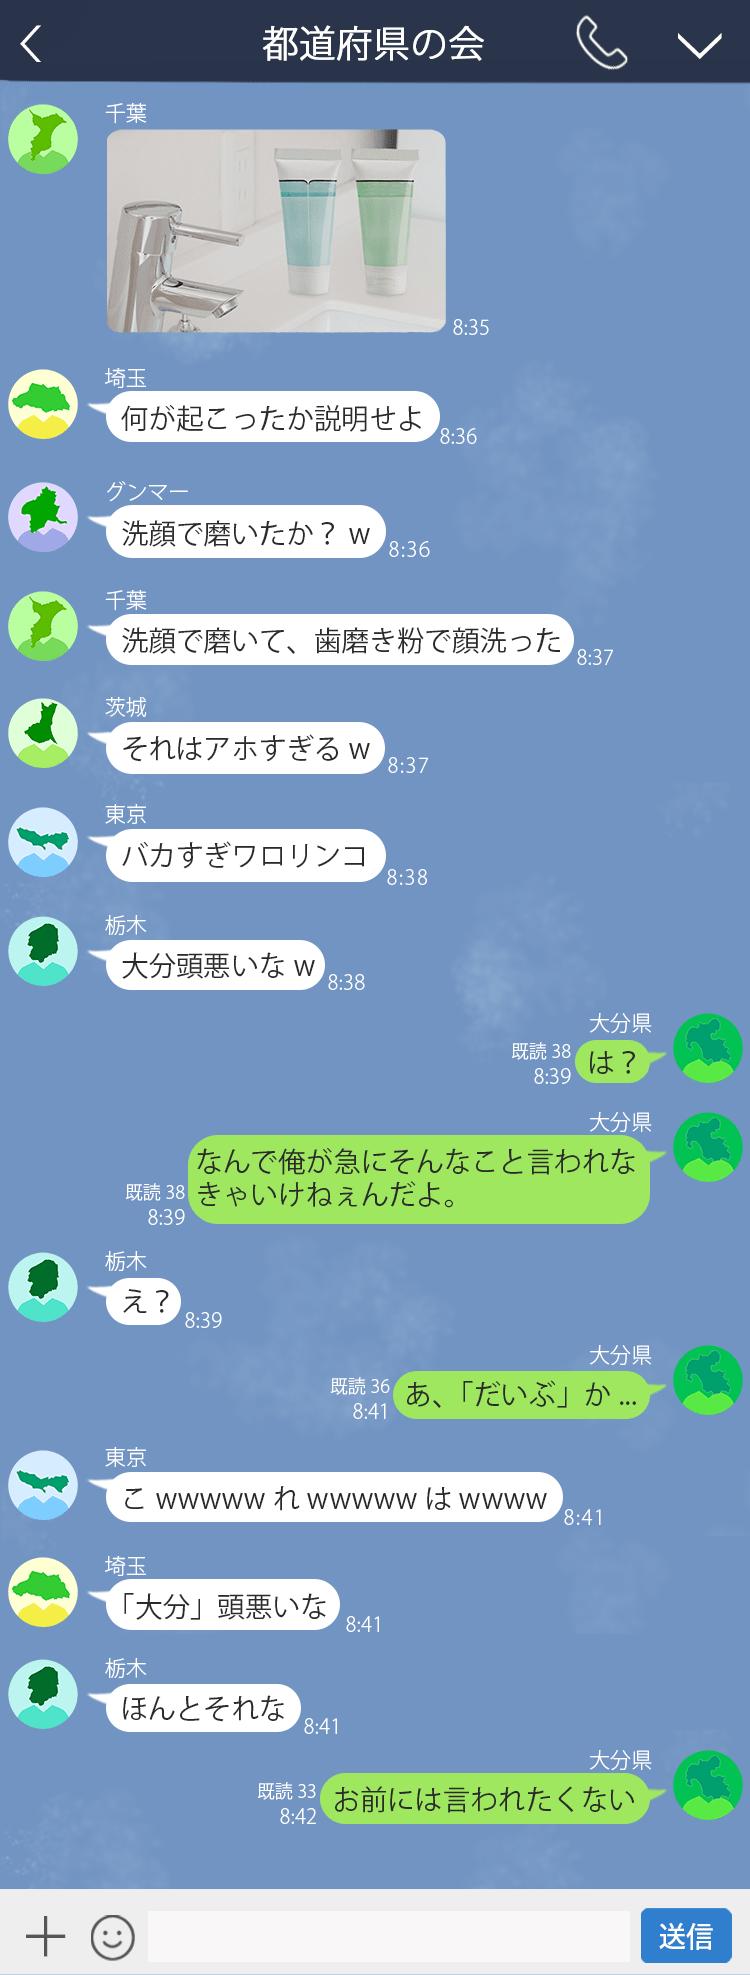 todohuken_LINE_7